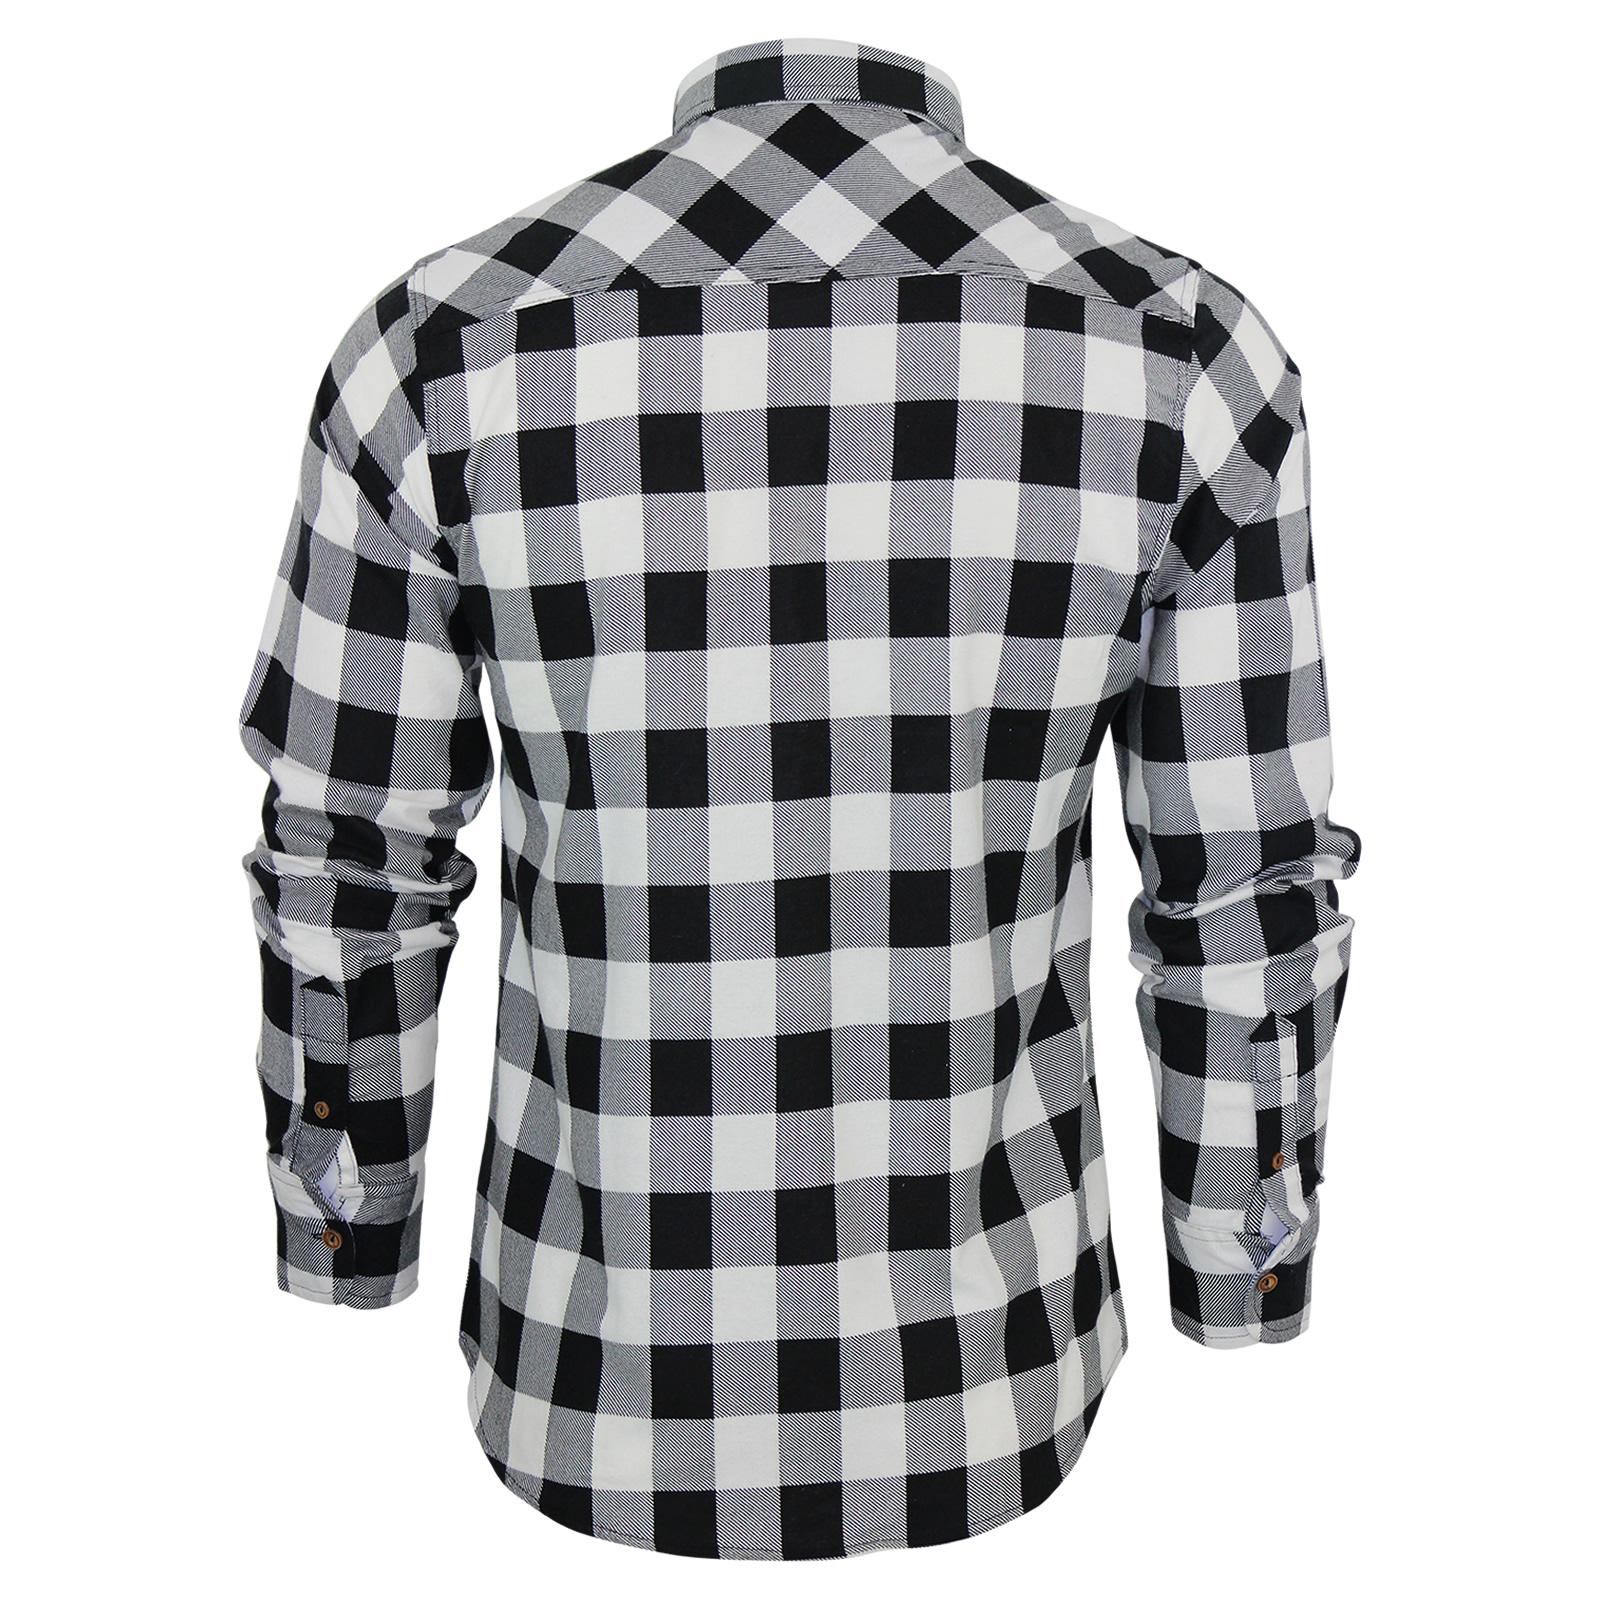 Mens check shirt brave soul jack flannel brushed cotton for Men s lightweight flannel shirts